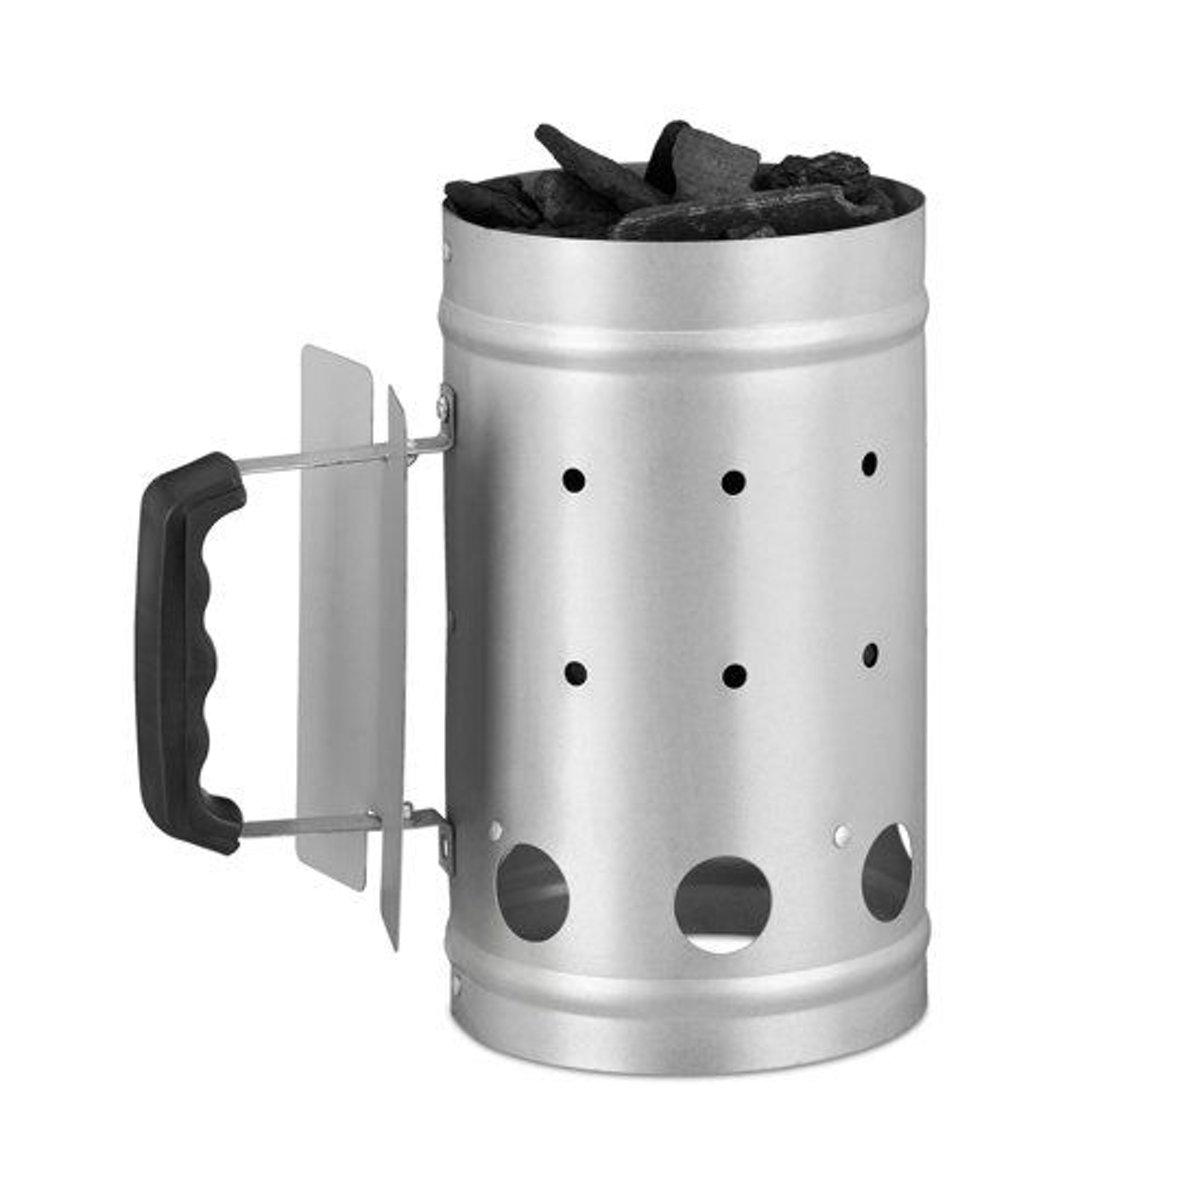 relaxdays brikettenstarter - BBQ starter - houtskool starter - barbecue starter - zilver kopen